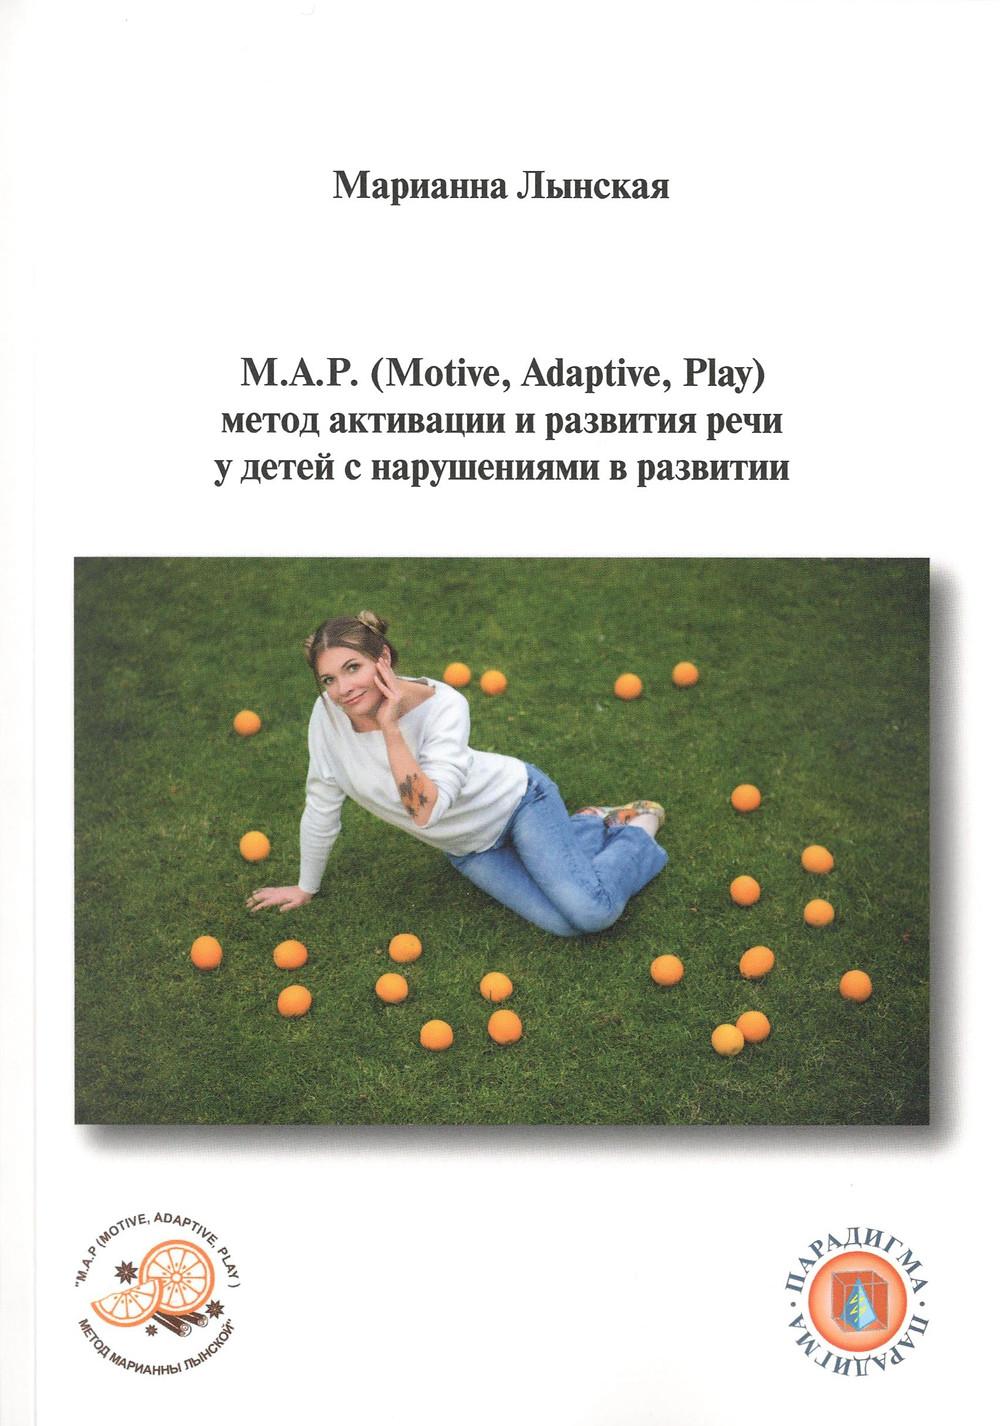 Марианна Лынская  M.A.P.-метод активации и развития речи у детей с нарушениями в развитии